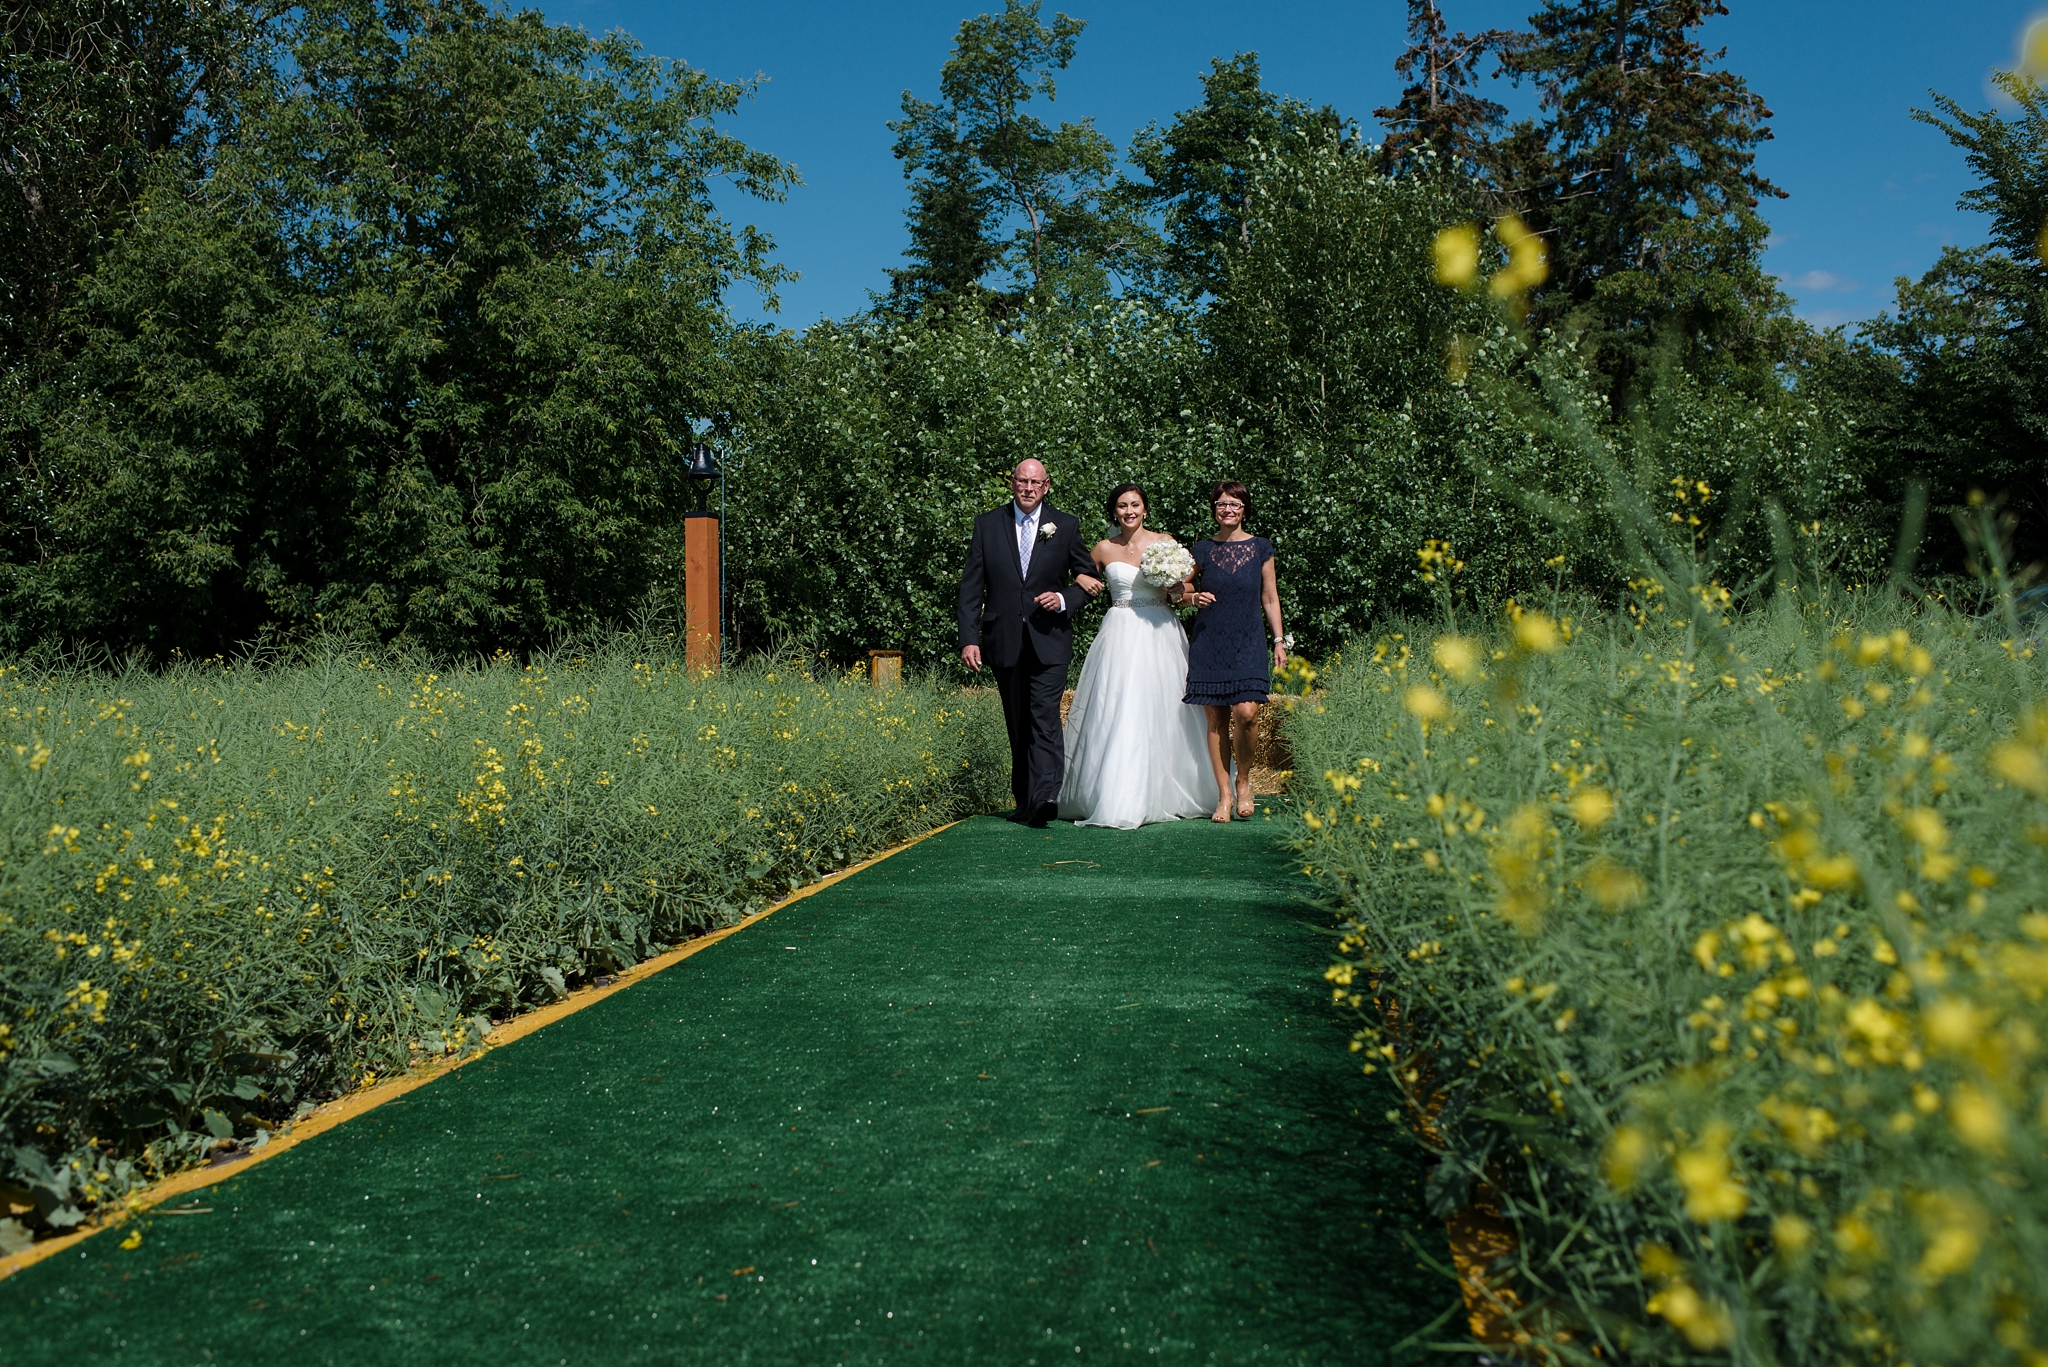 kaihla_tonai_intimate_wedding_elopement_photographer_0046